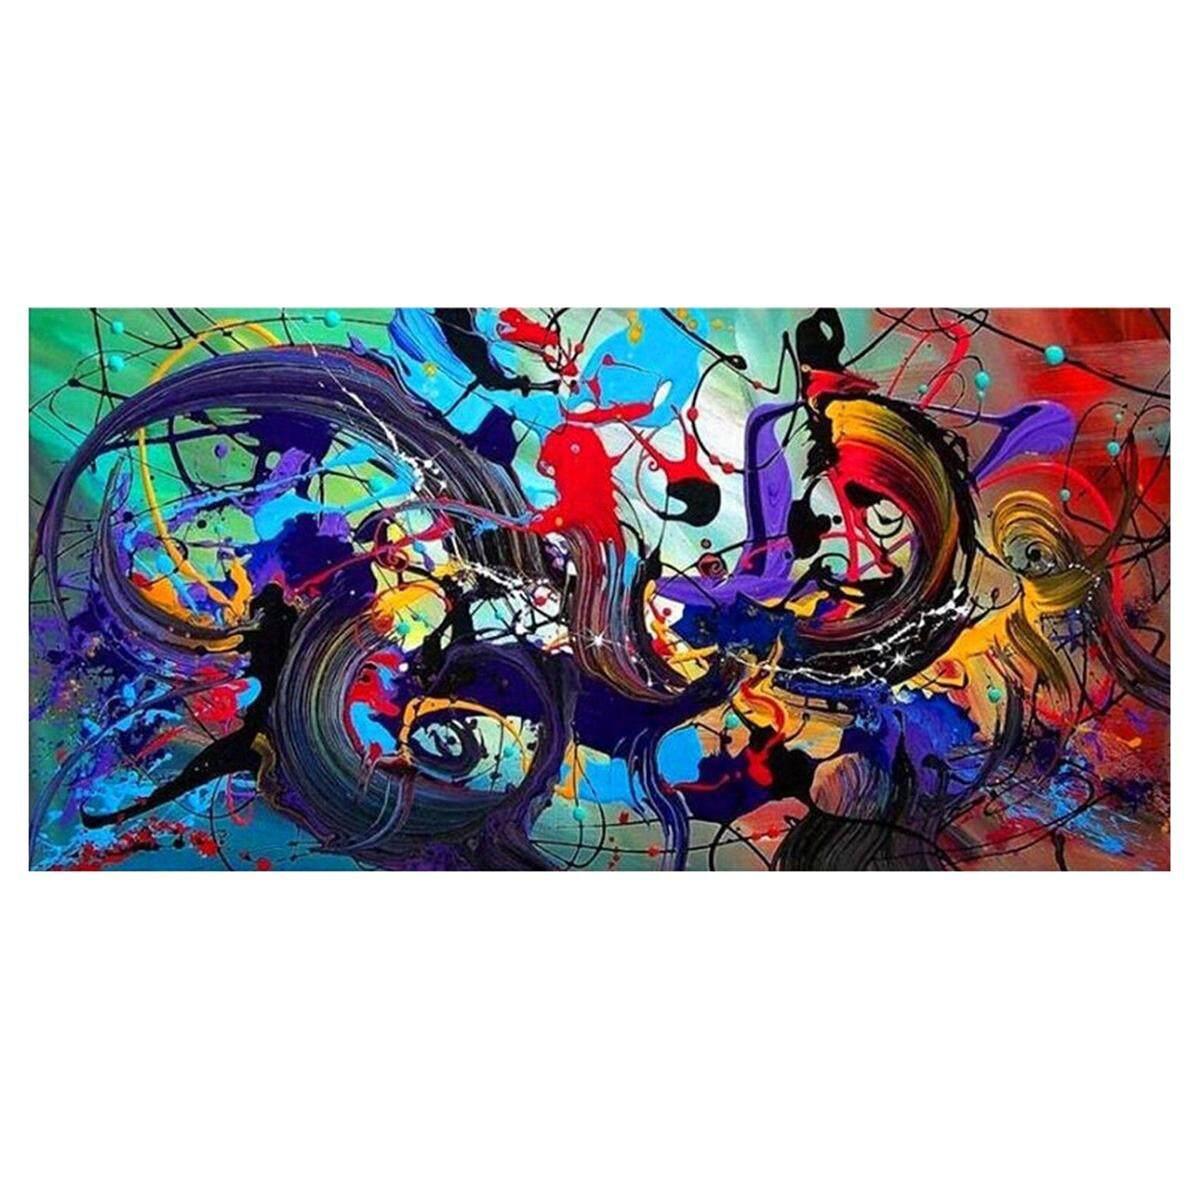 FS Seni Abstrak Modern Minyak Cetakan Lukisan Kanvas Gambar Rumah Dekorasi Dinding Tanpa Bingkai